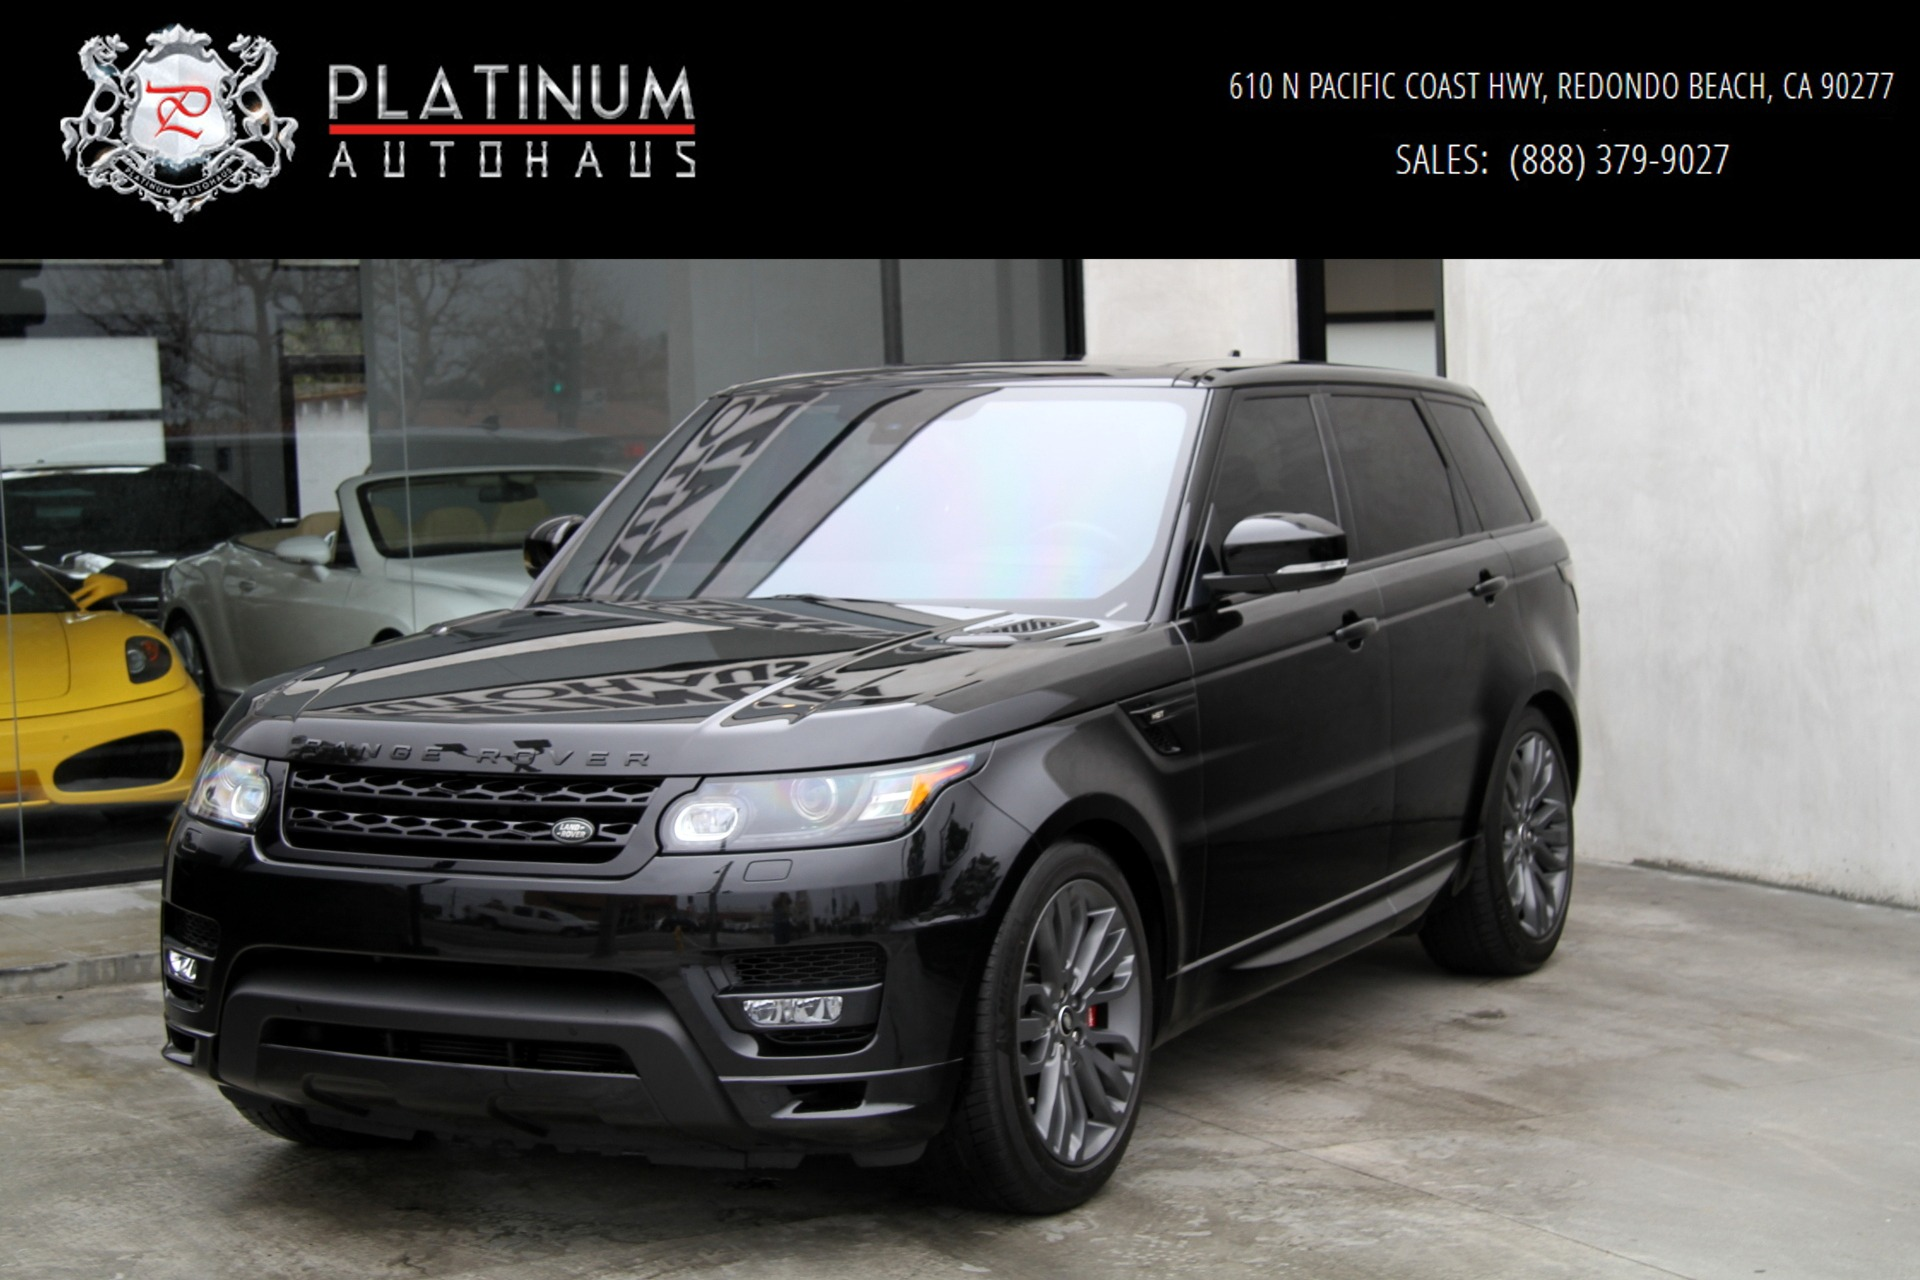 https://www.platinumautohaus.com/imagetag/12656/main/l/Used-2016-Land-Rover-Range-Rover-Sport-**-HST-LIMITED-EDITION-PKG-**.jpg